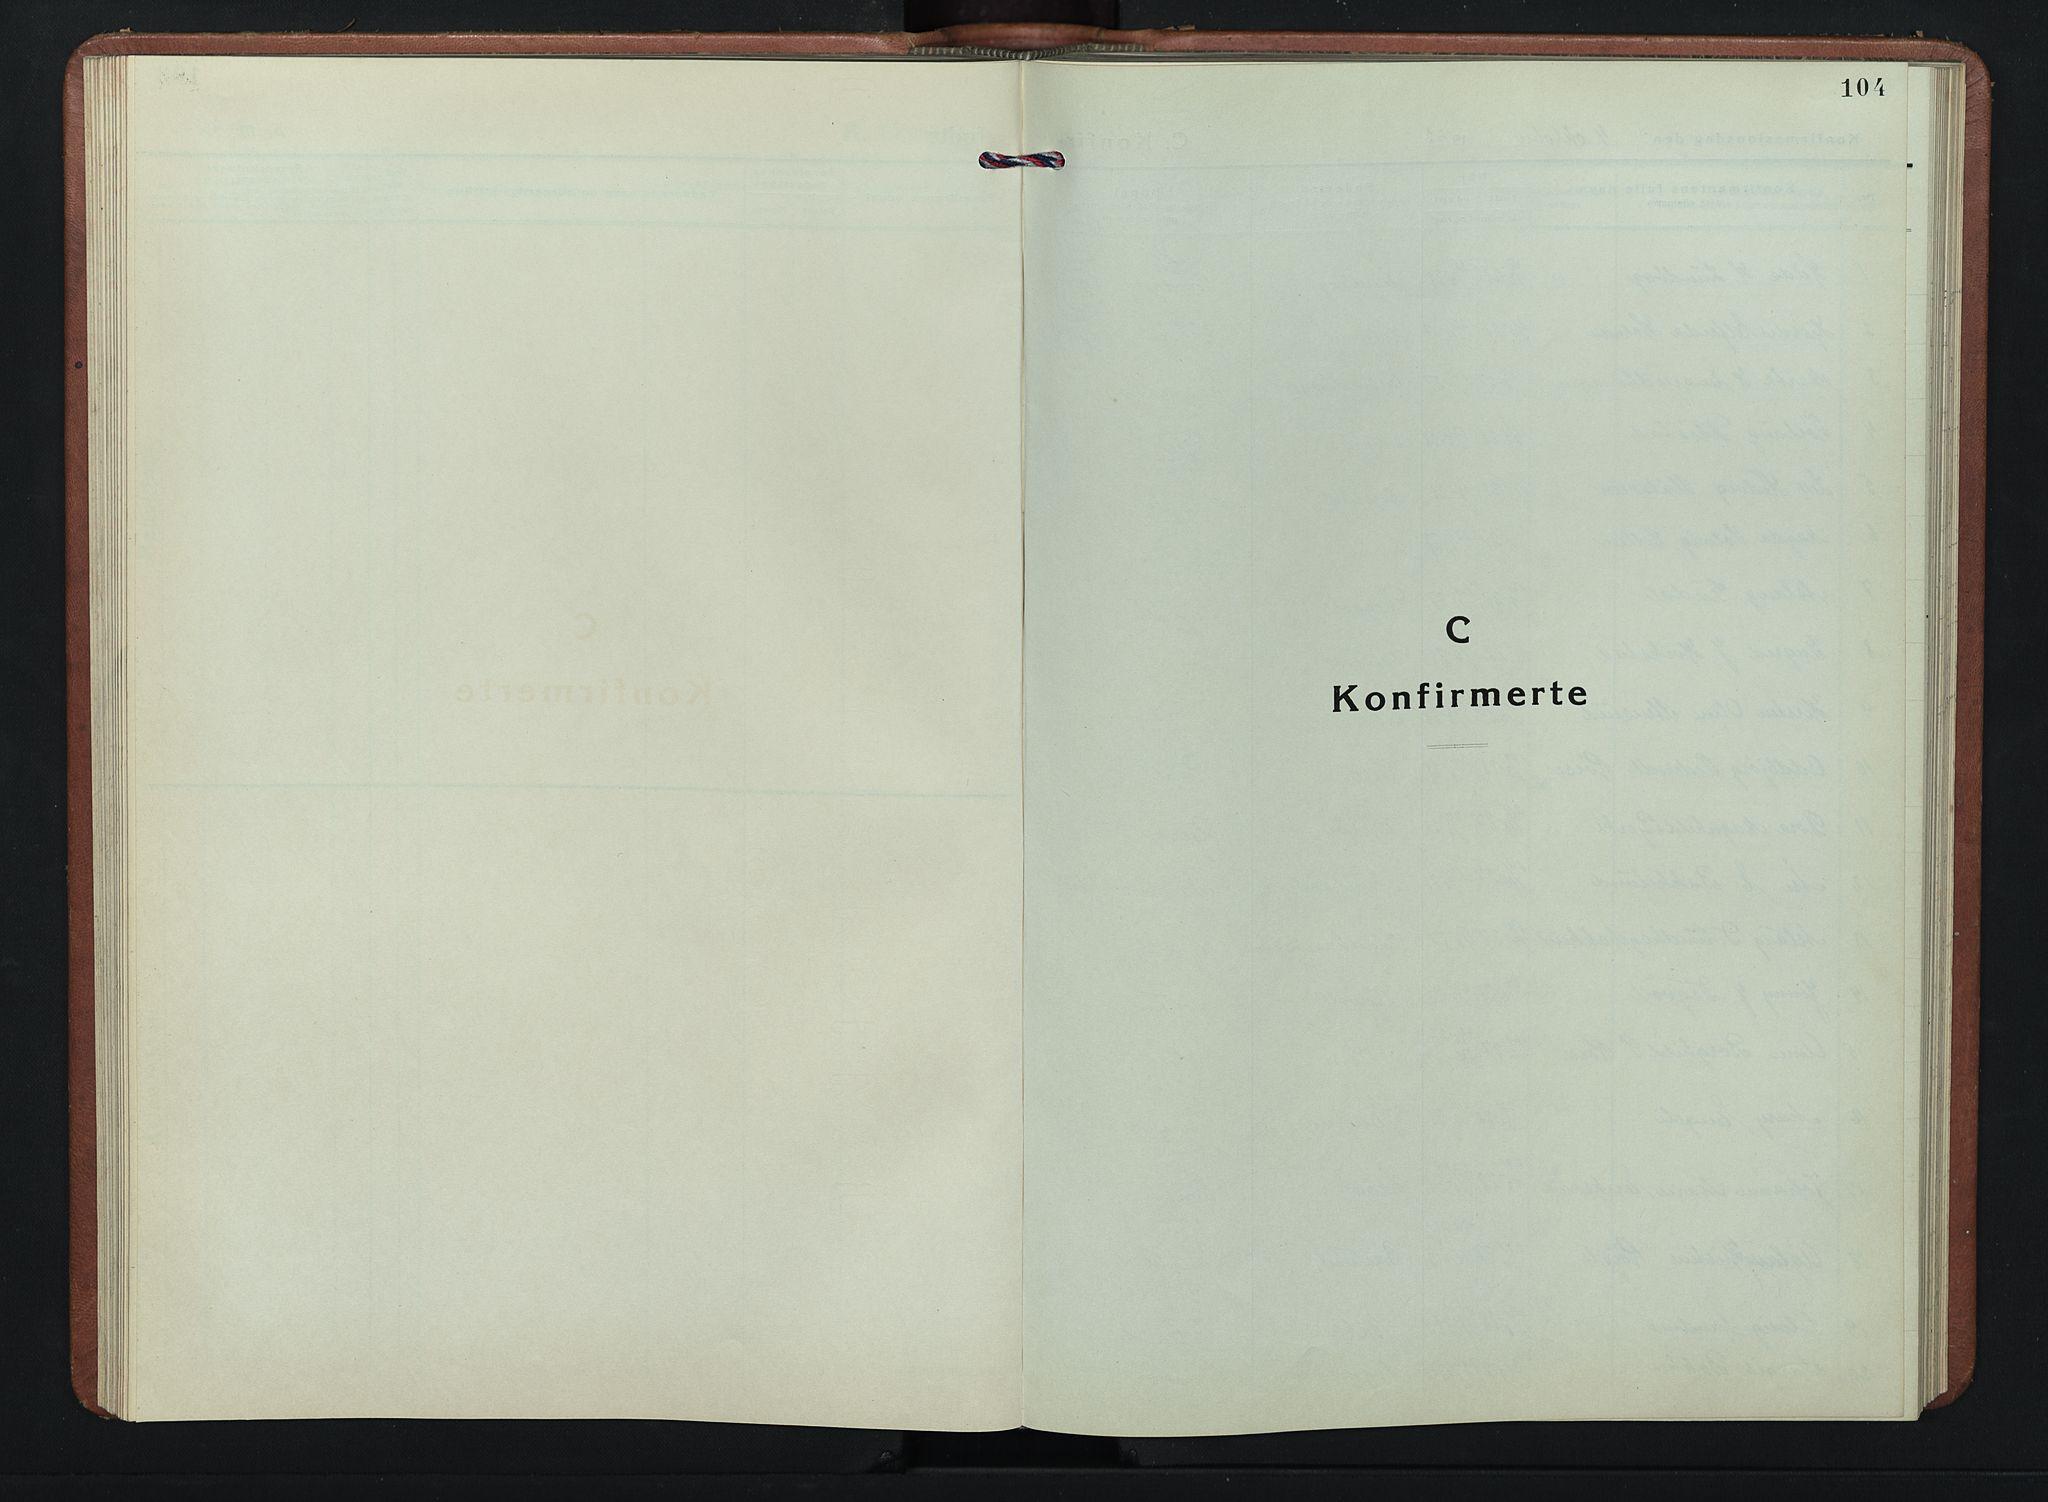 SAH, Kolbu prestekontor, Klokkerbok nr. 4, 1942-1953, s. 104